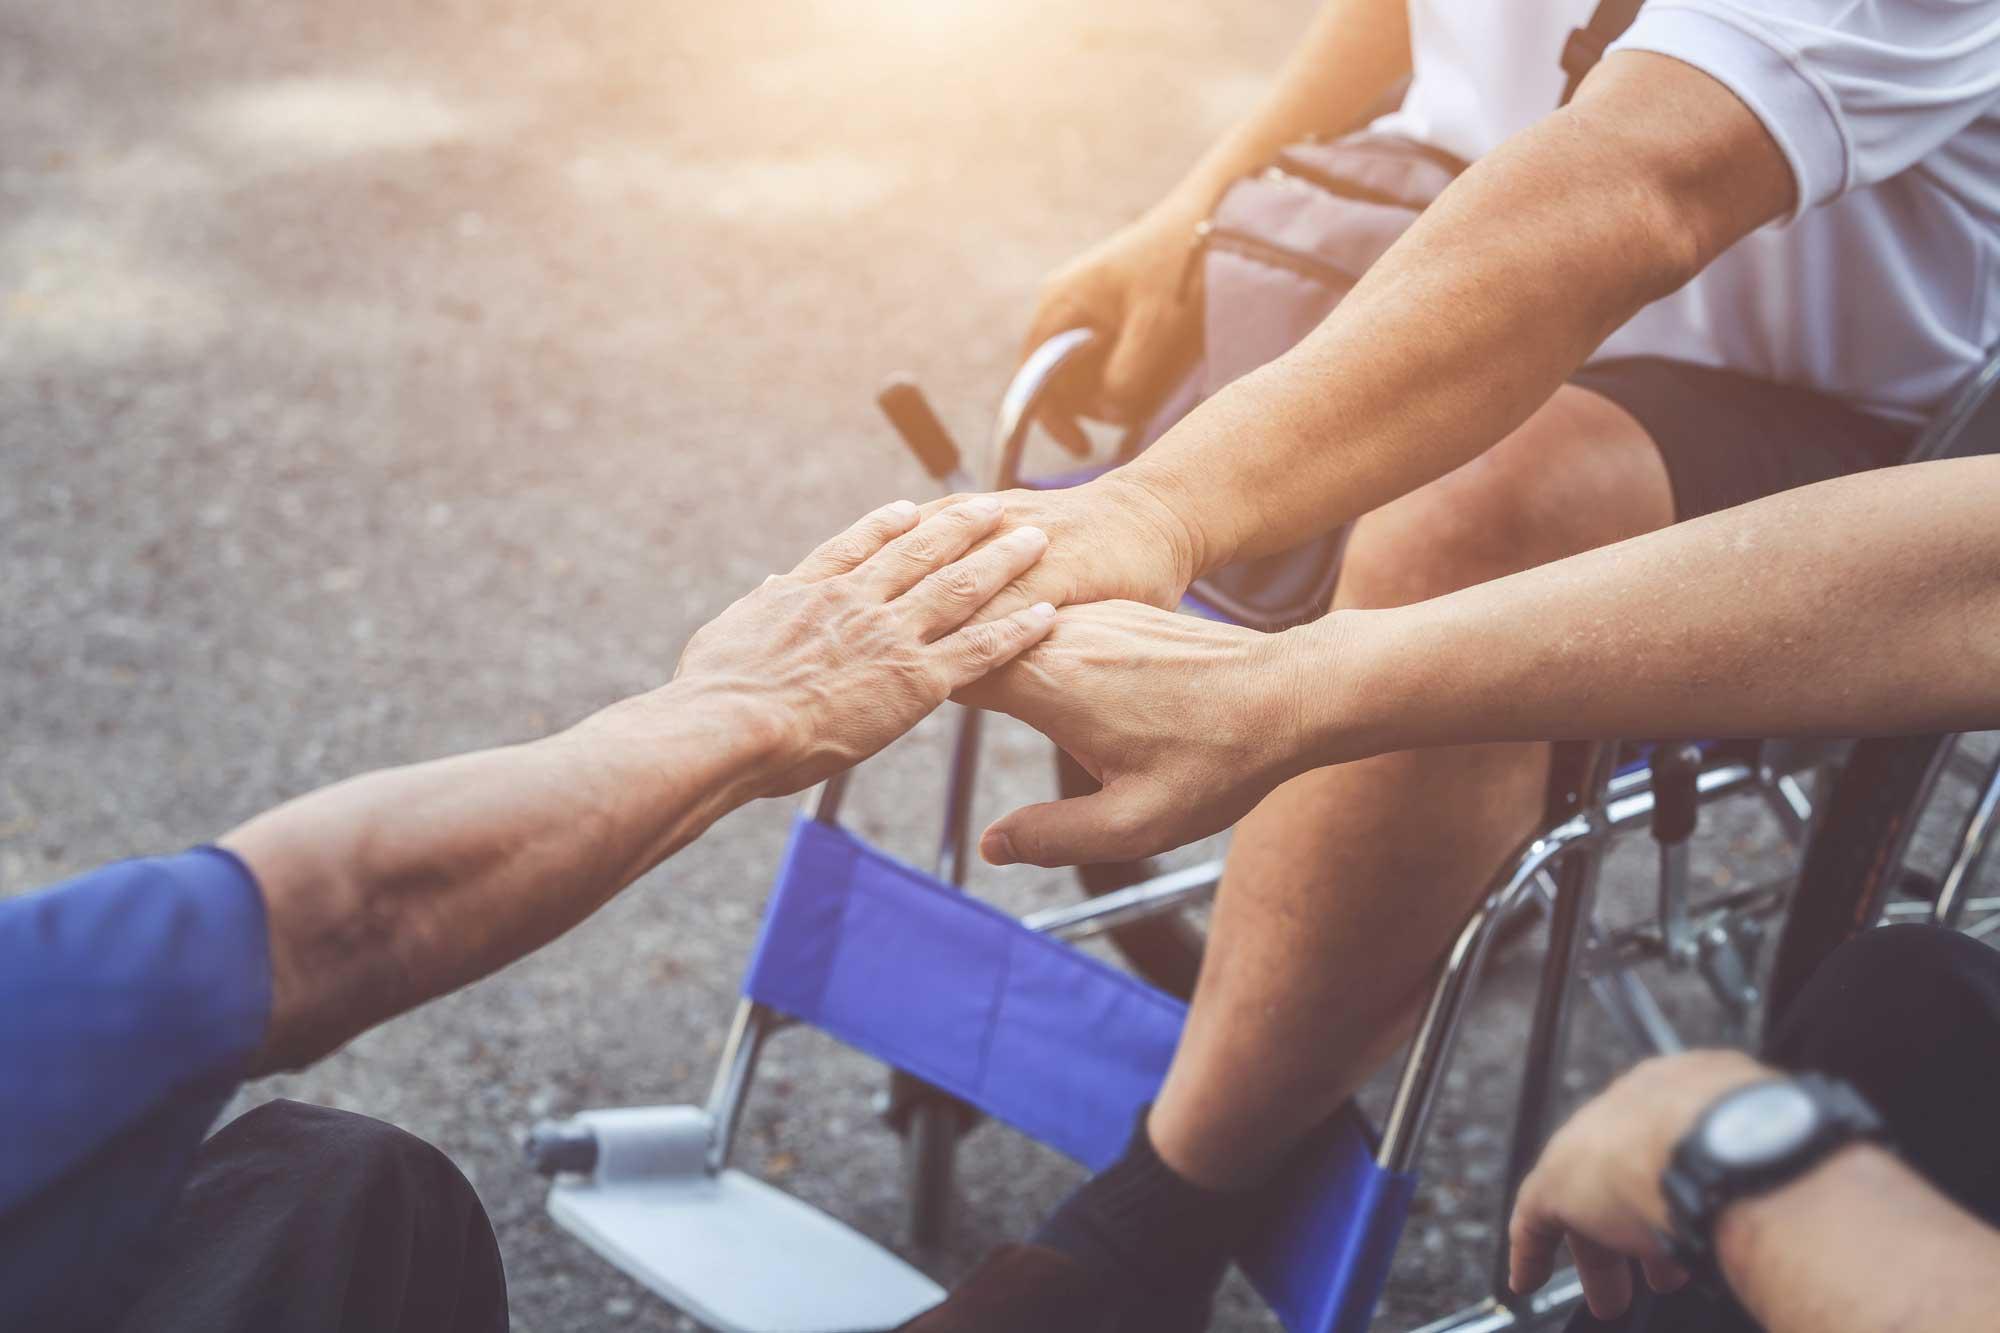 bigstock-Three-Of-Disabled-People-Sitti-229323022.jpg